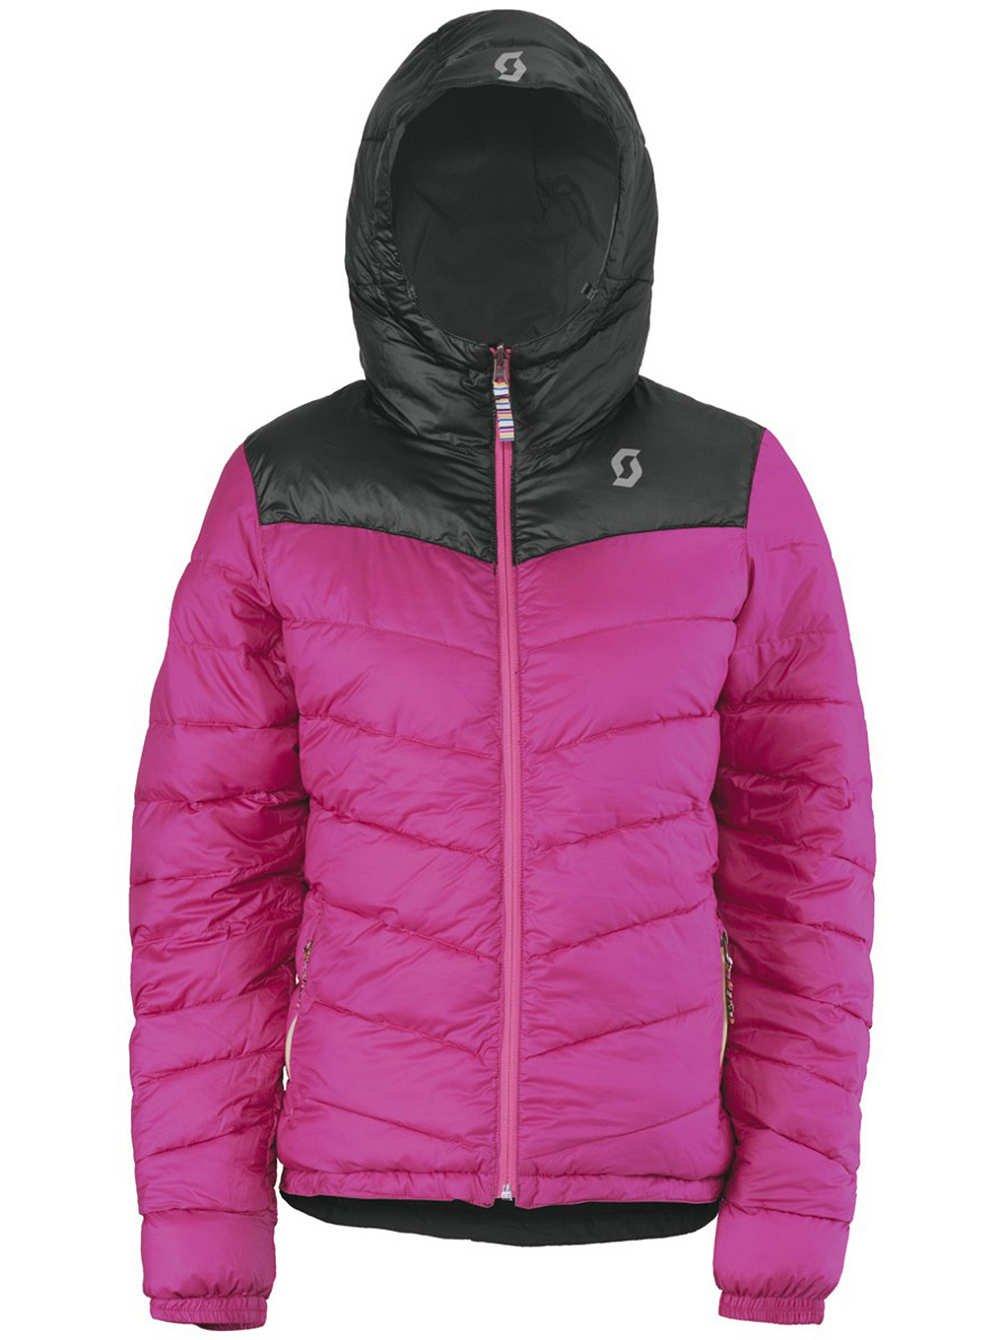 Damen Snowboard Jacke Scott Kimbra Jacket kaufen